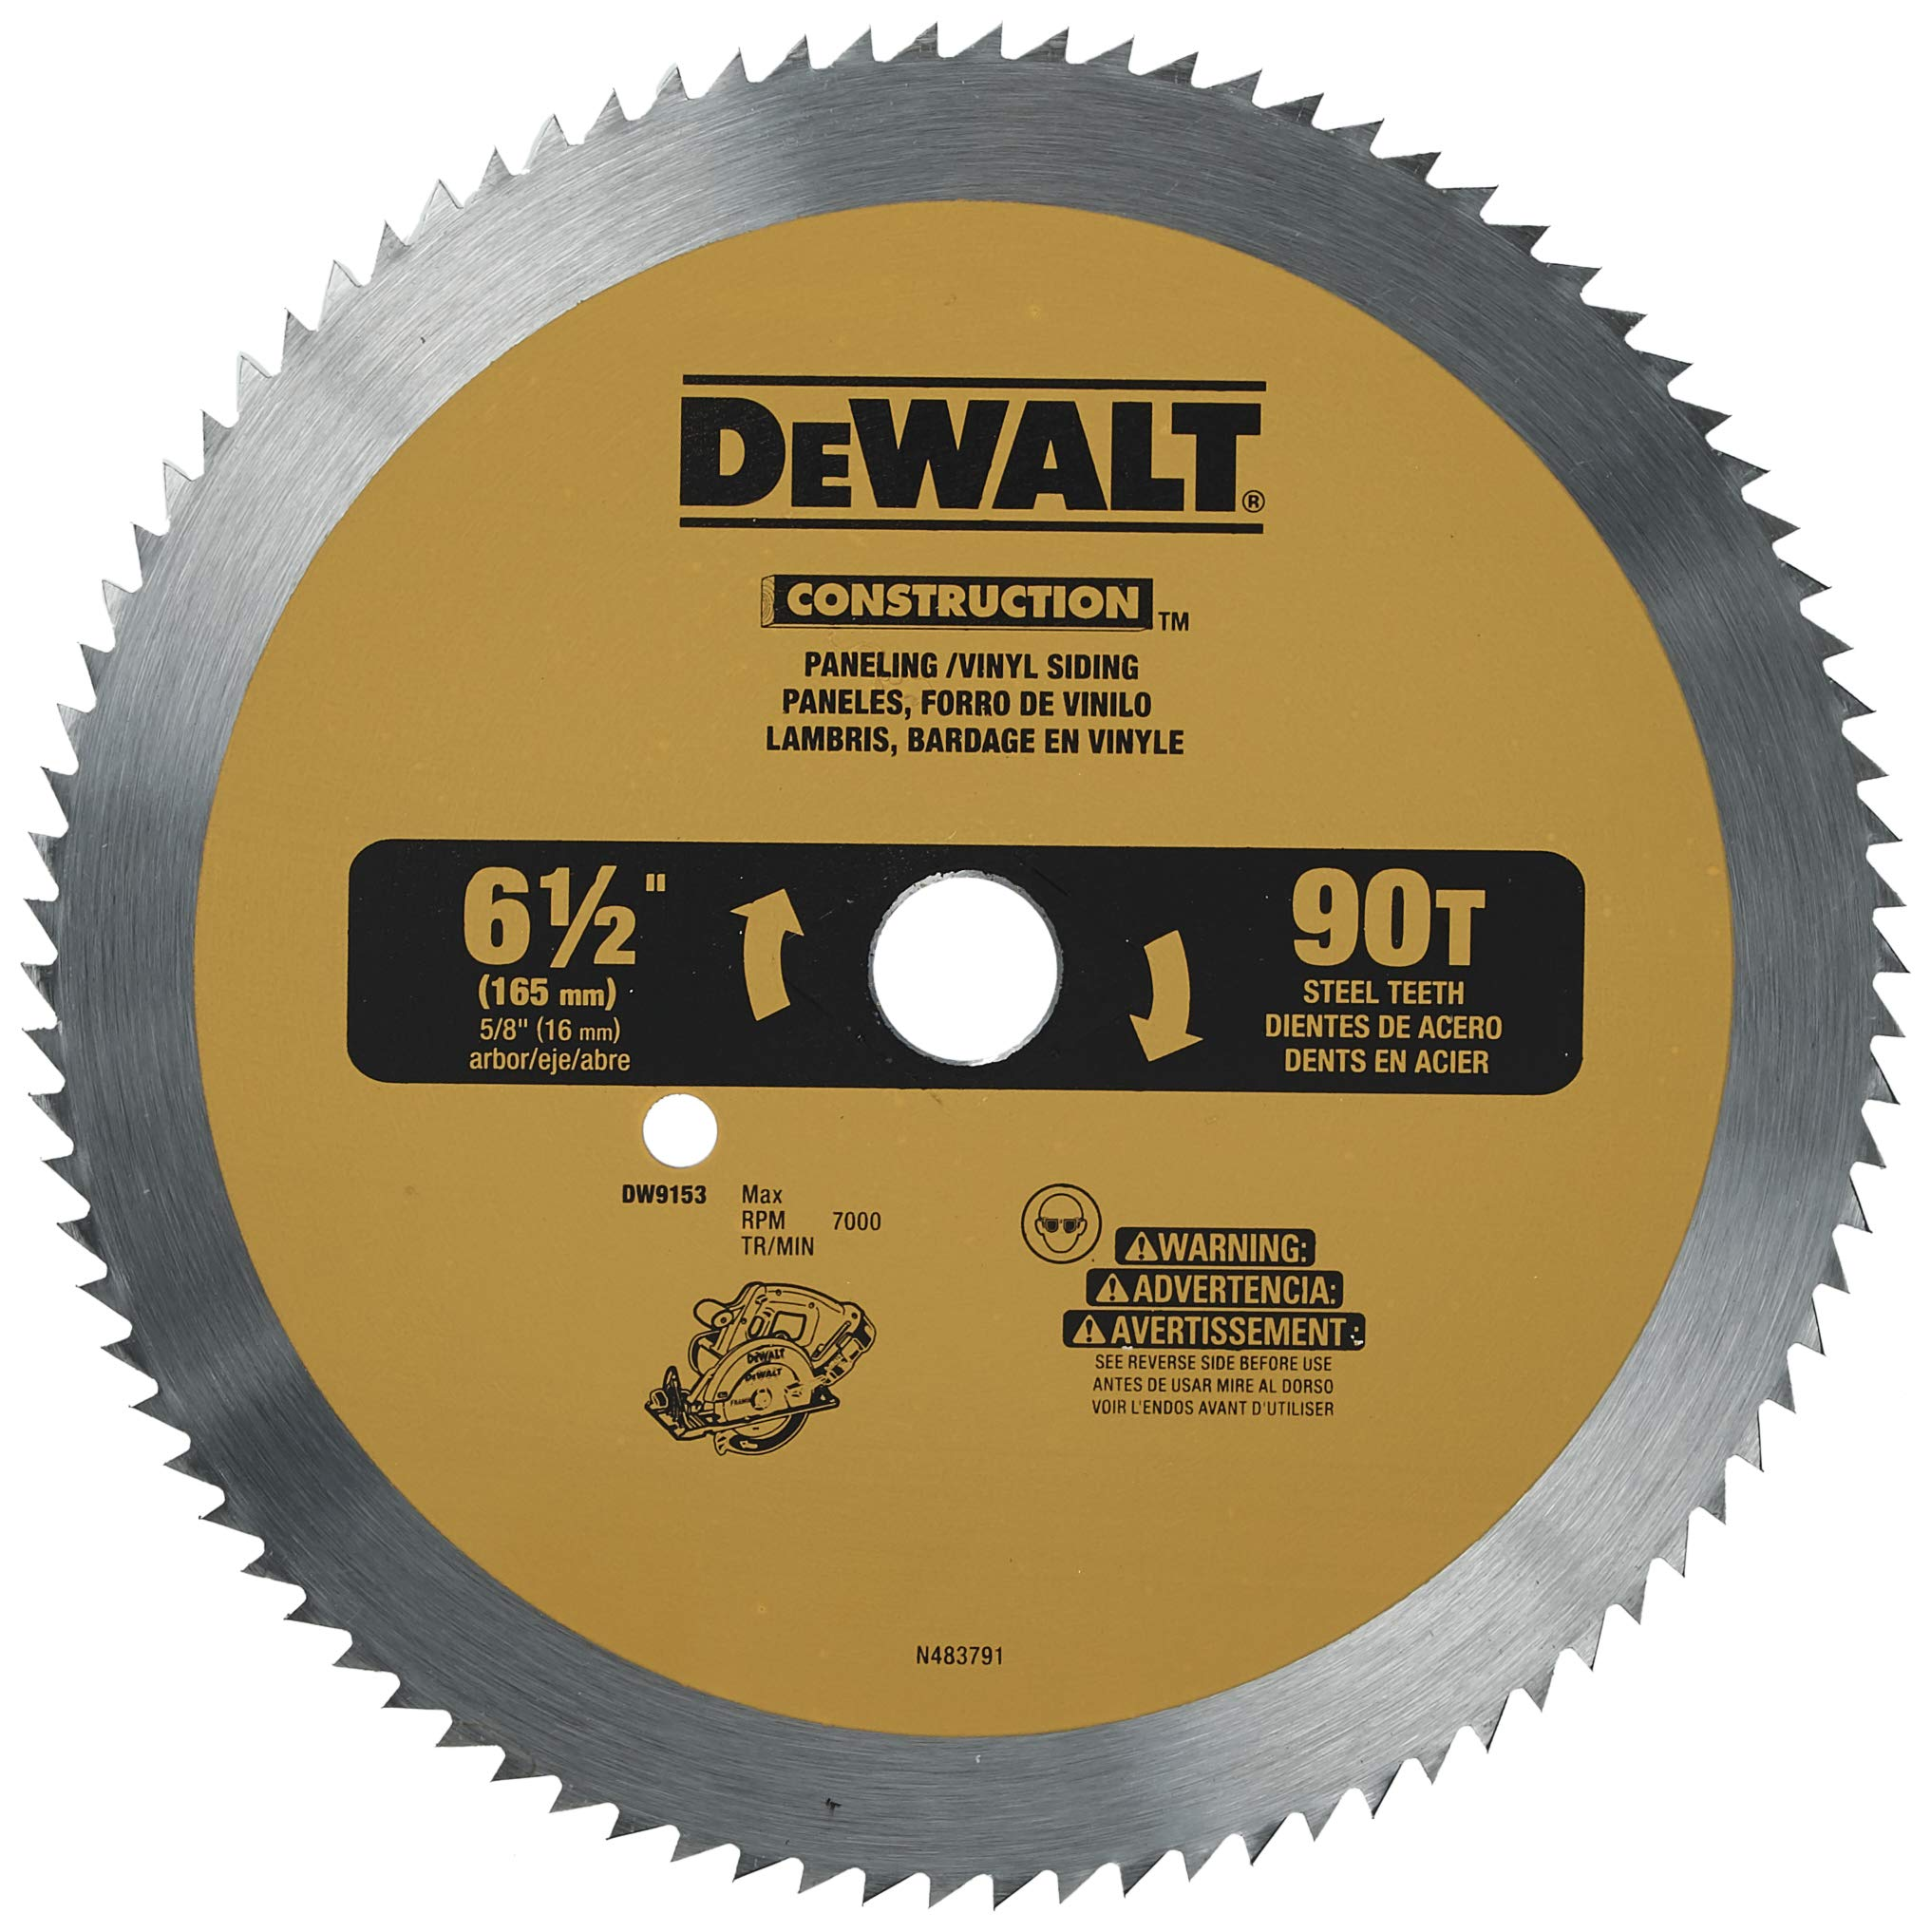 DEWALT 6-1/2-Inch Circular Saw Blade for Paneling/Vinyl, 90-Tooth (DW9153)